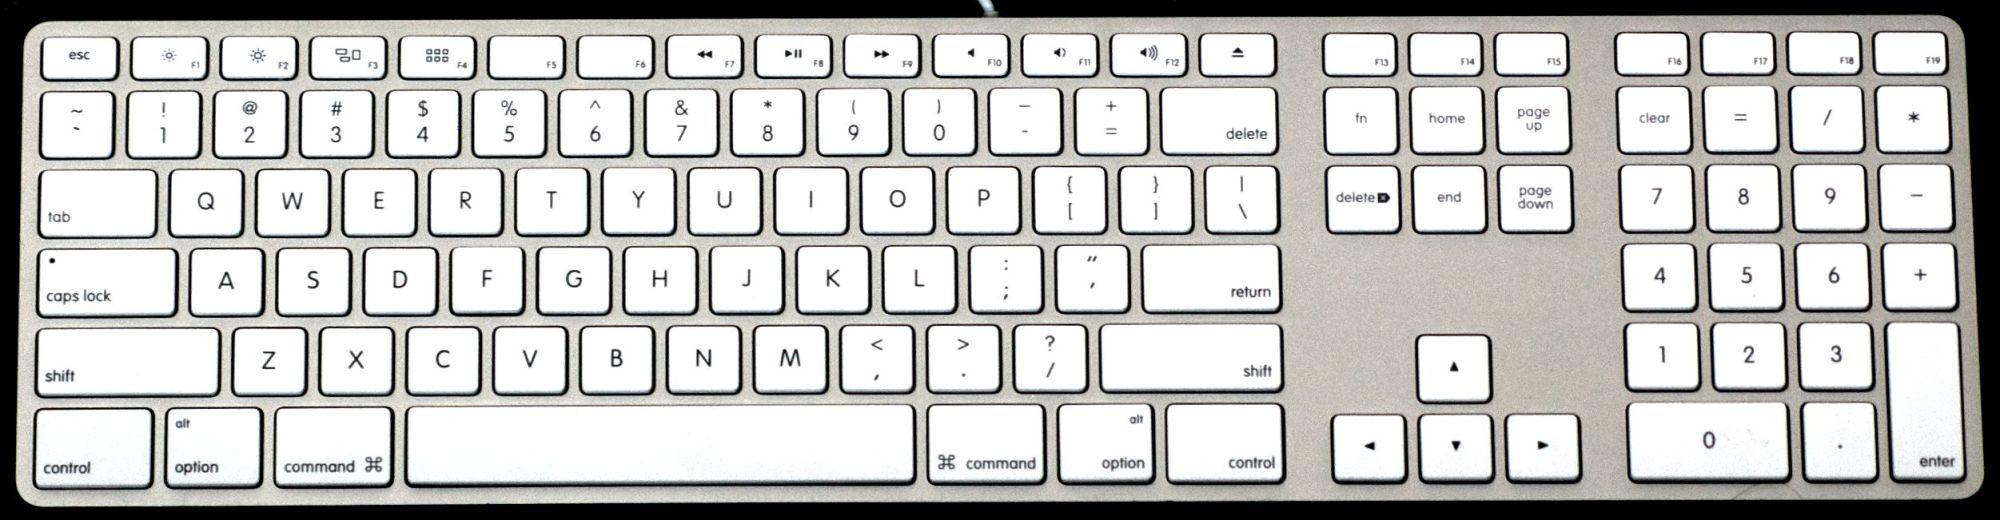 hight resolution of  macintosh keyboard photo jpeg 2502 x 651 pixels 266 8 kb